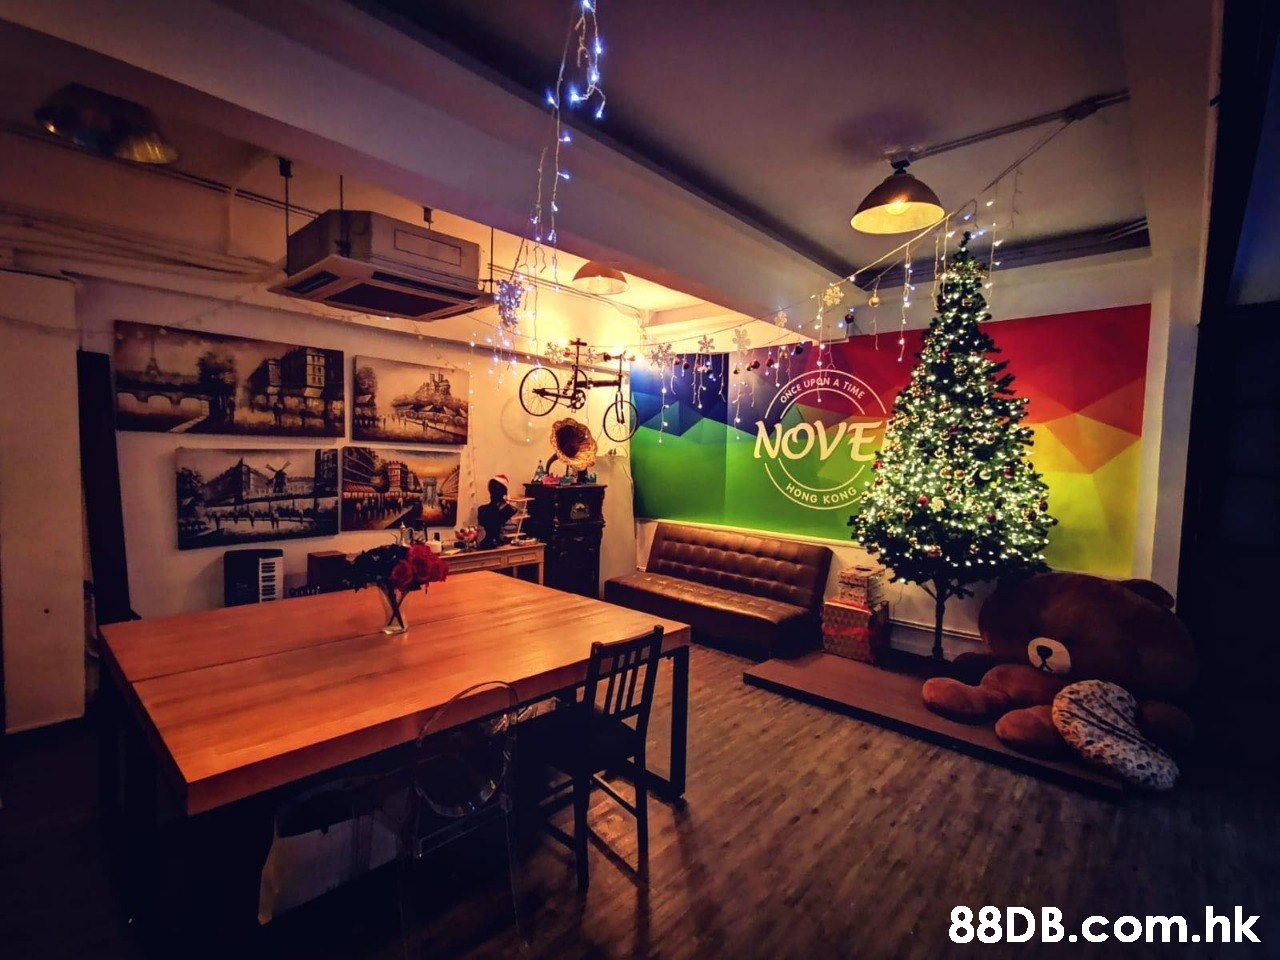 ONCE OPDA A TIME NOVE HONG KONG .hk  Interior design,Sky,Room,Lighting,Building